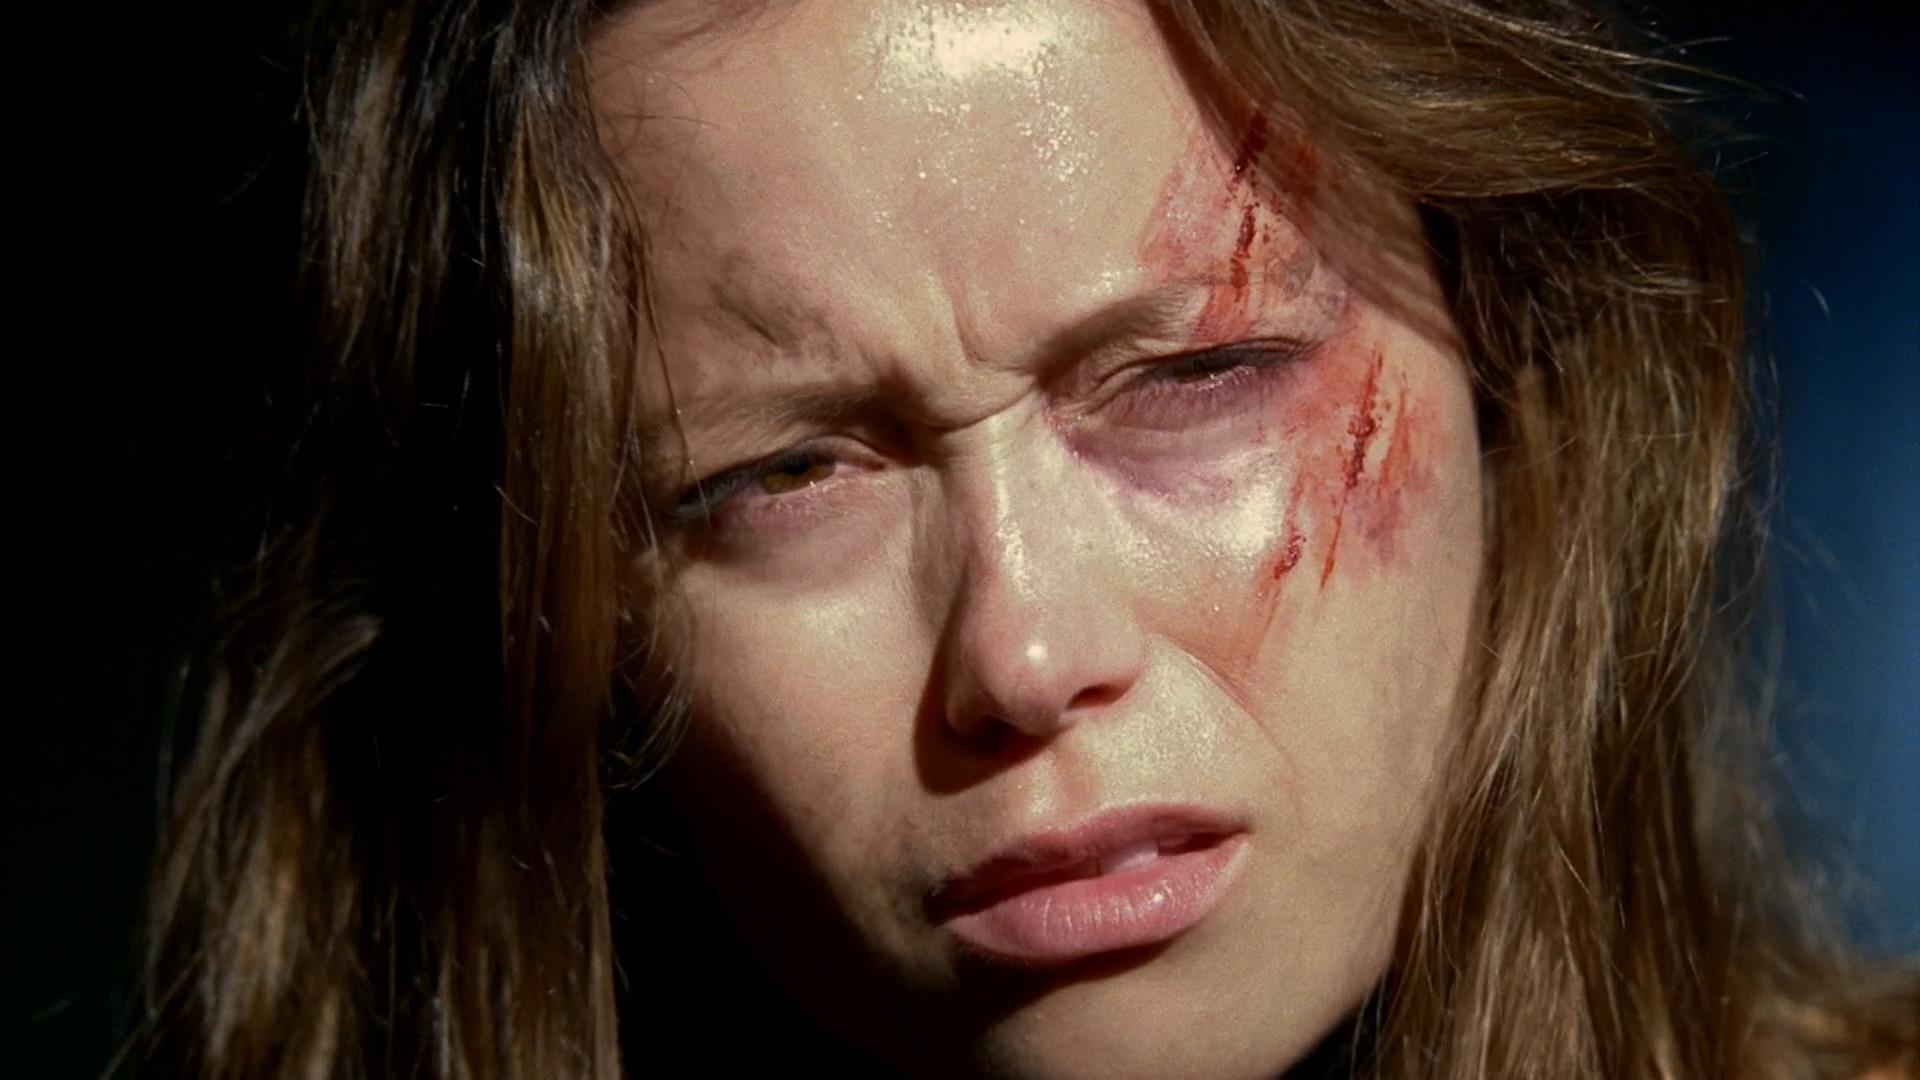 TV Show - Terminator: The Sarah Connor Chronicles  Summer Glau Scar Cameron Phillips Wallpaper